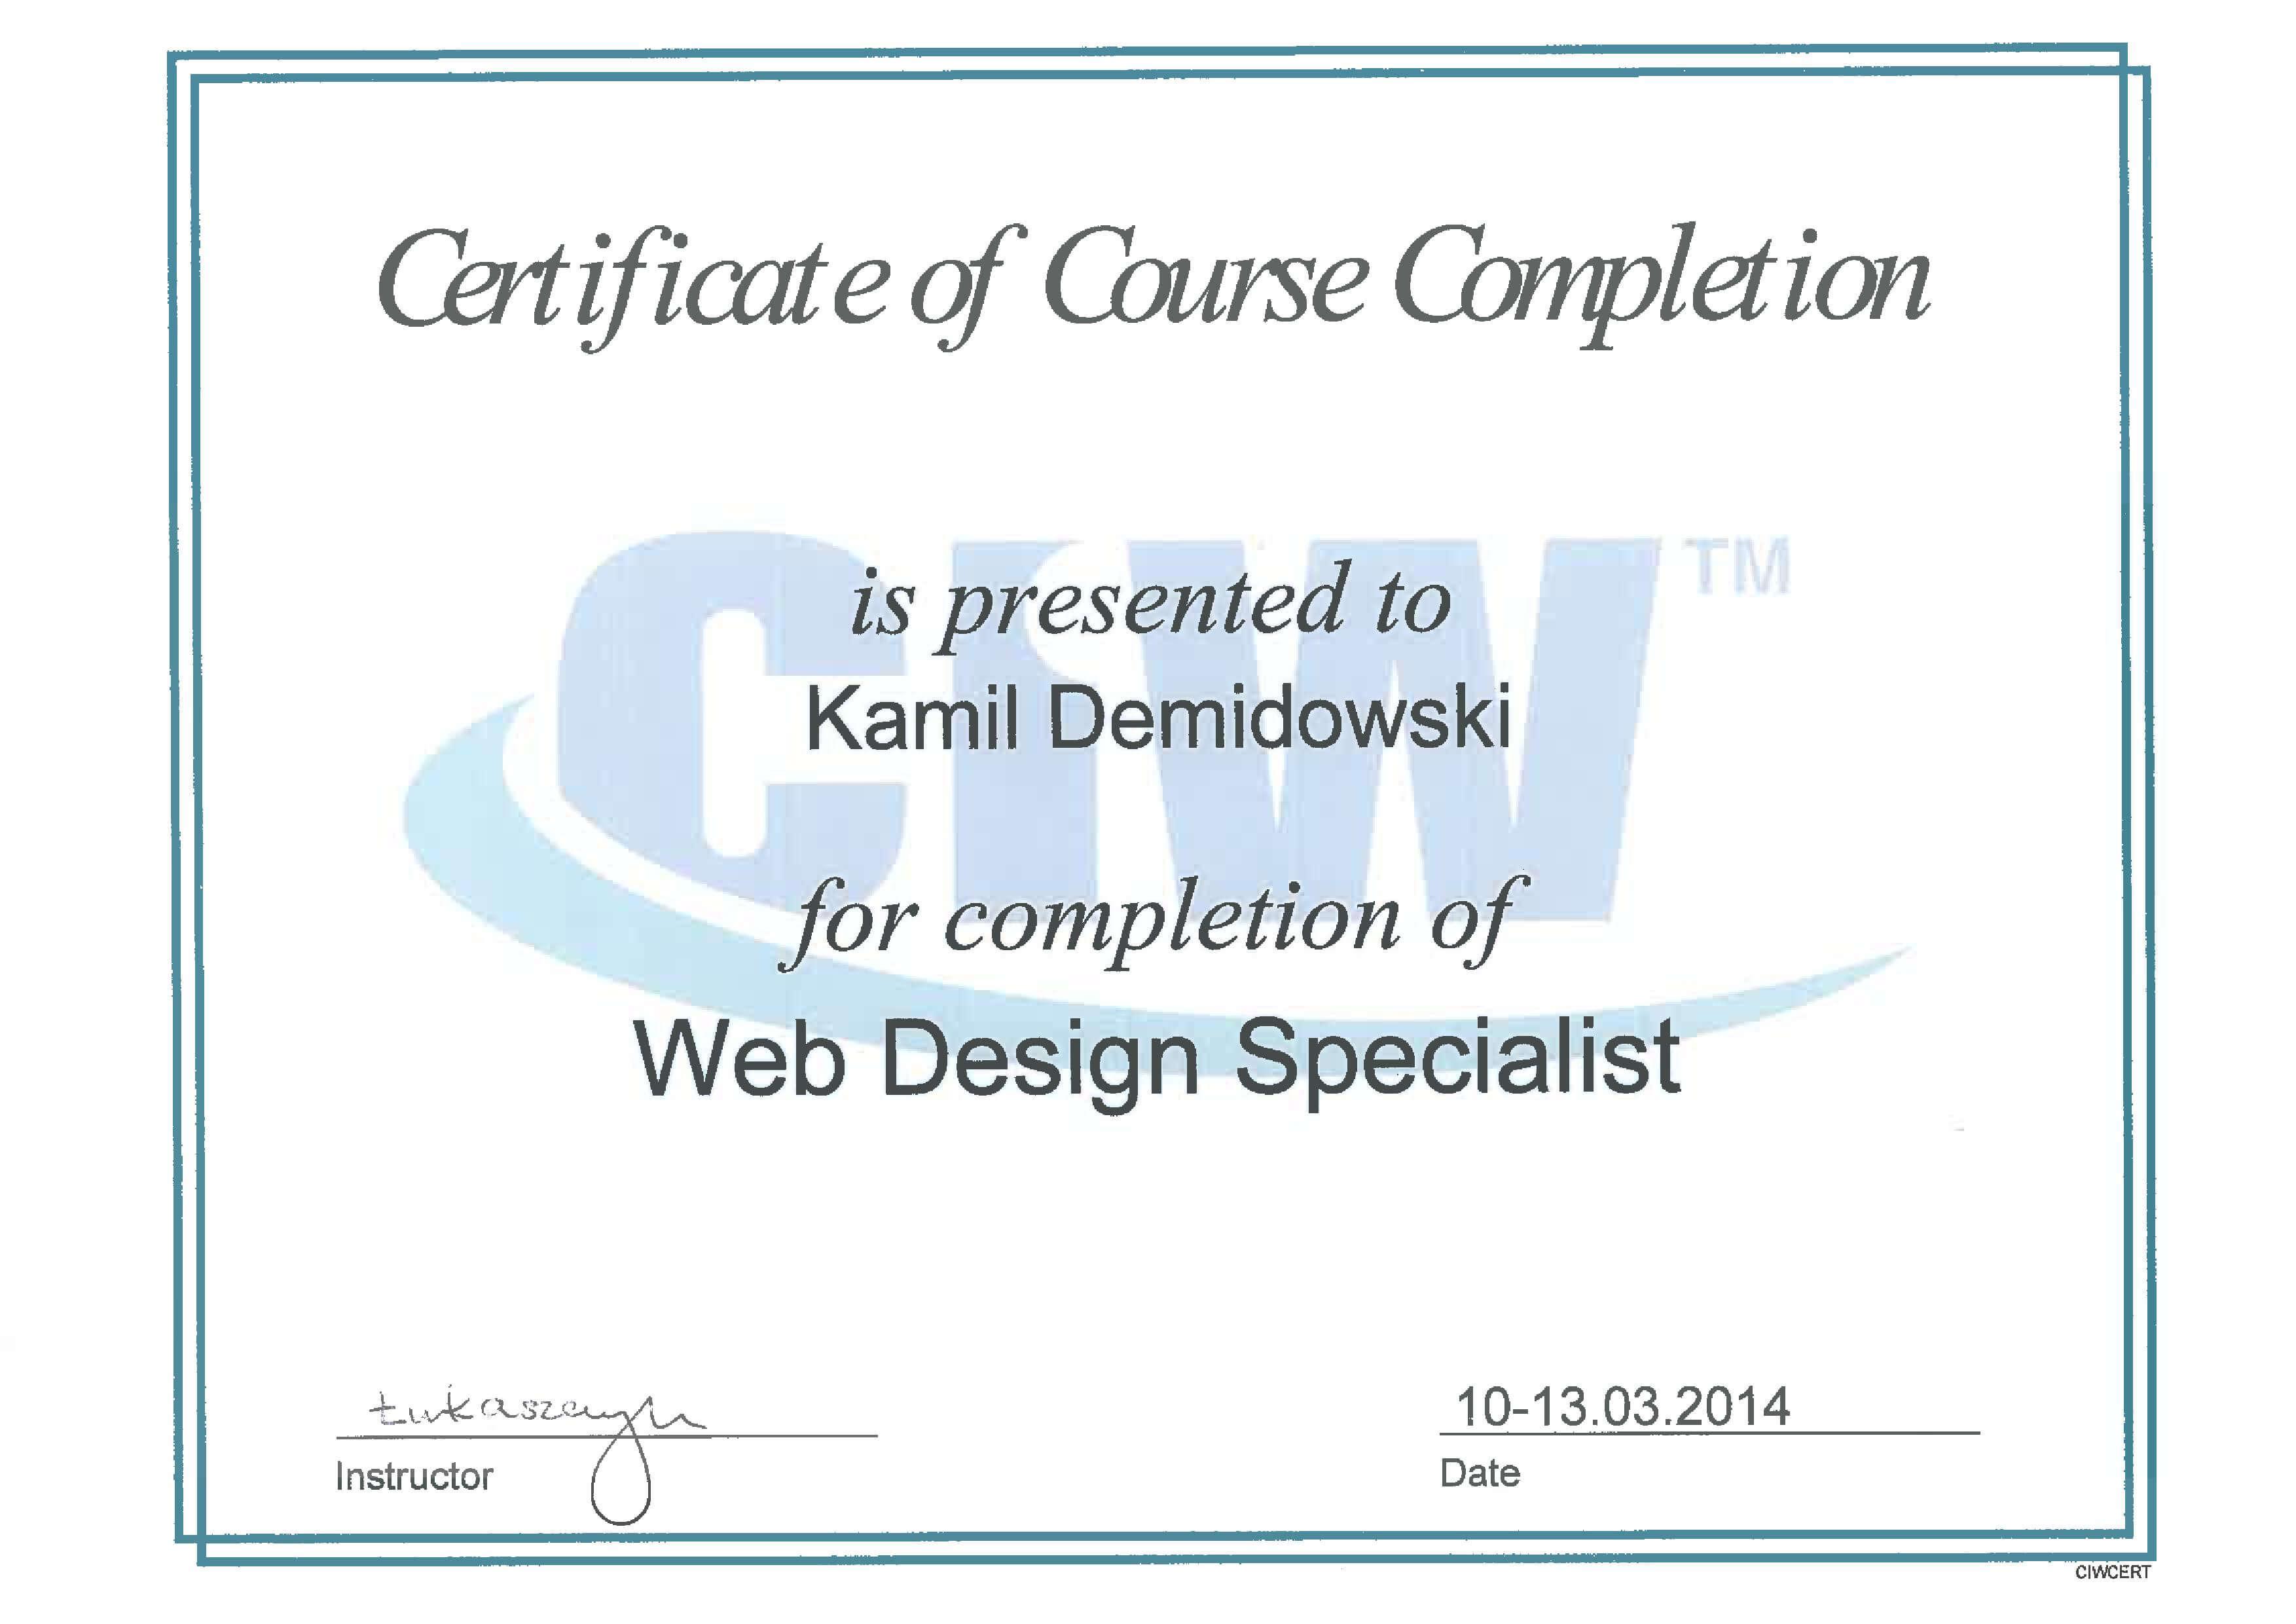 kamil-demidowski-web-design-specialist-CIW